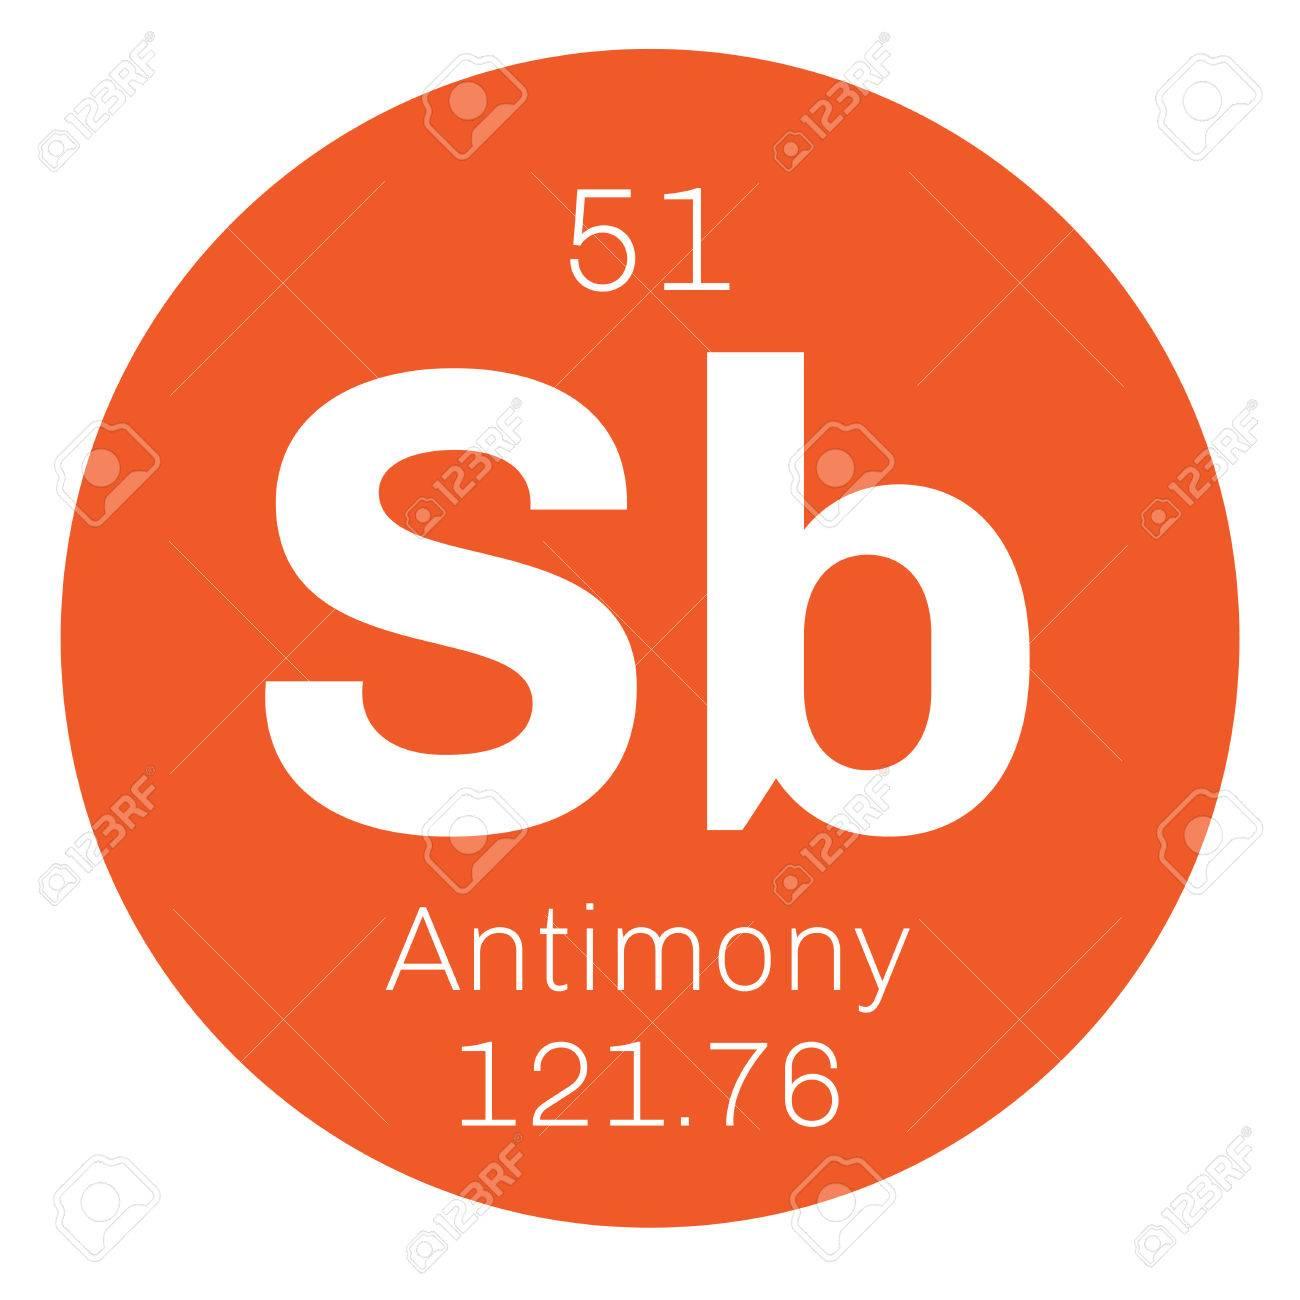 Elemento qumico de antimonio metaloide gray icono de color con el elemento qumico de antimonio metaloide gray icono de color con el nmero atmico y urtaz Images